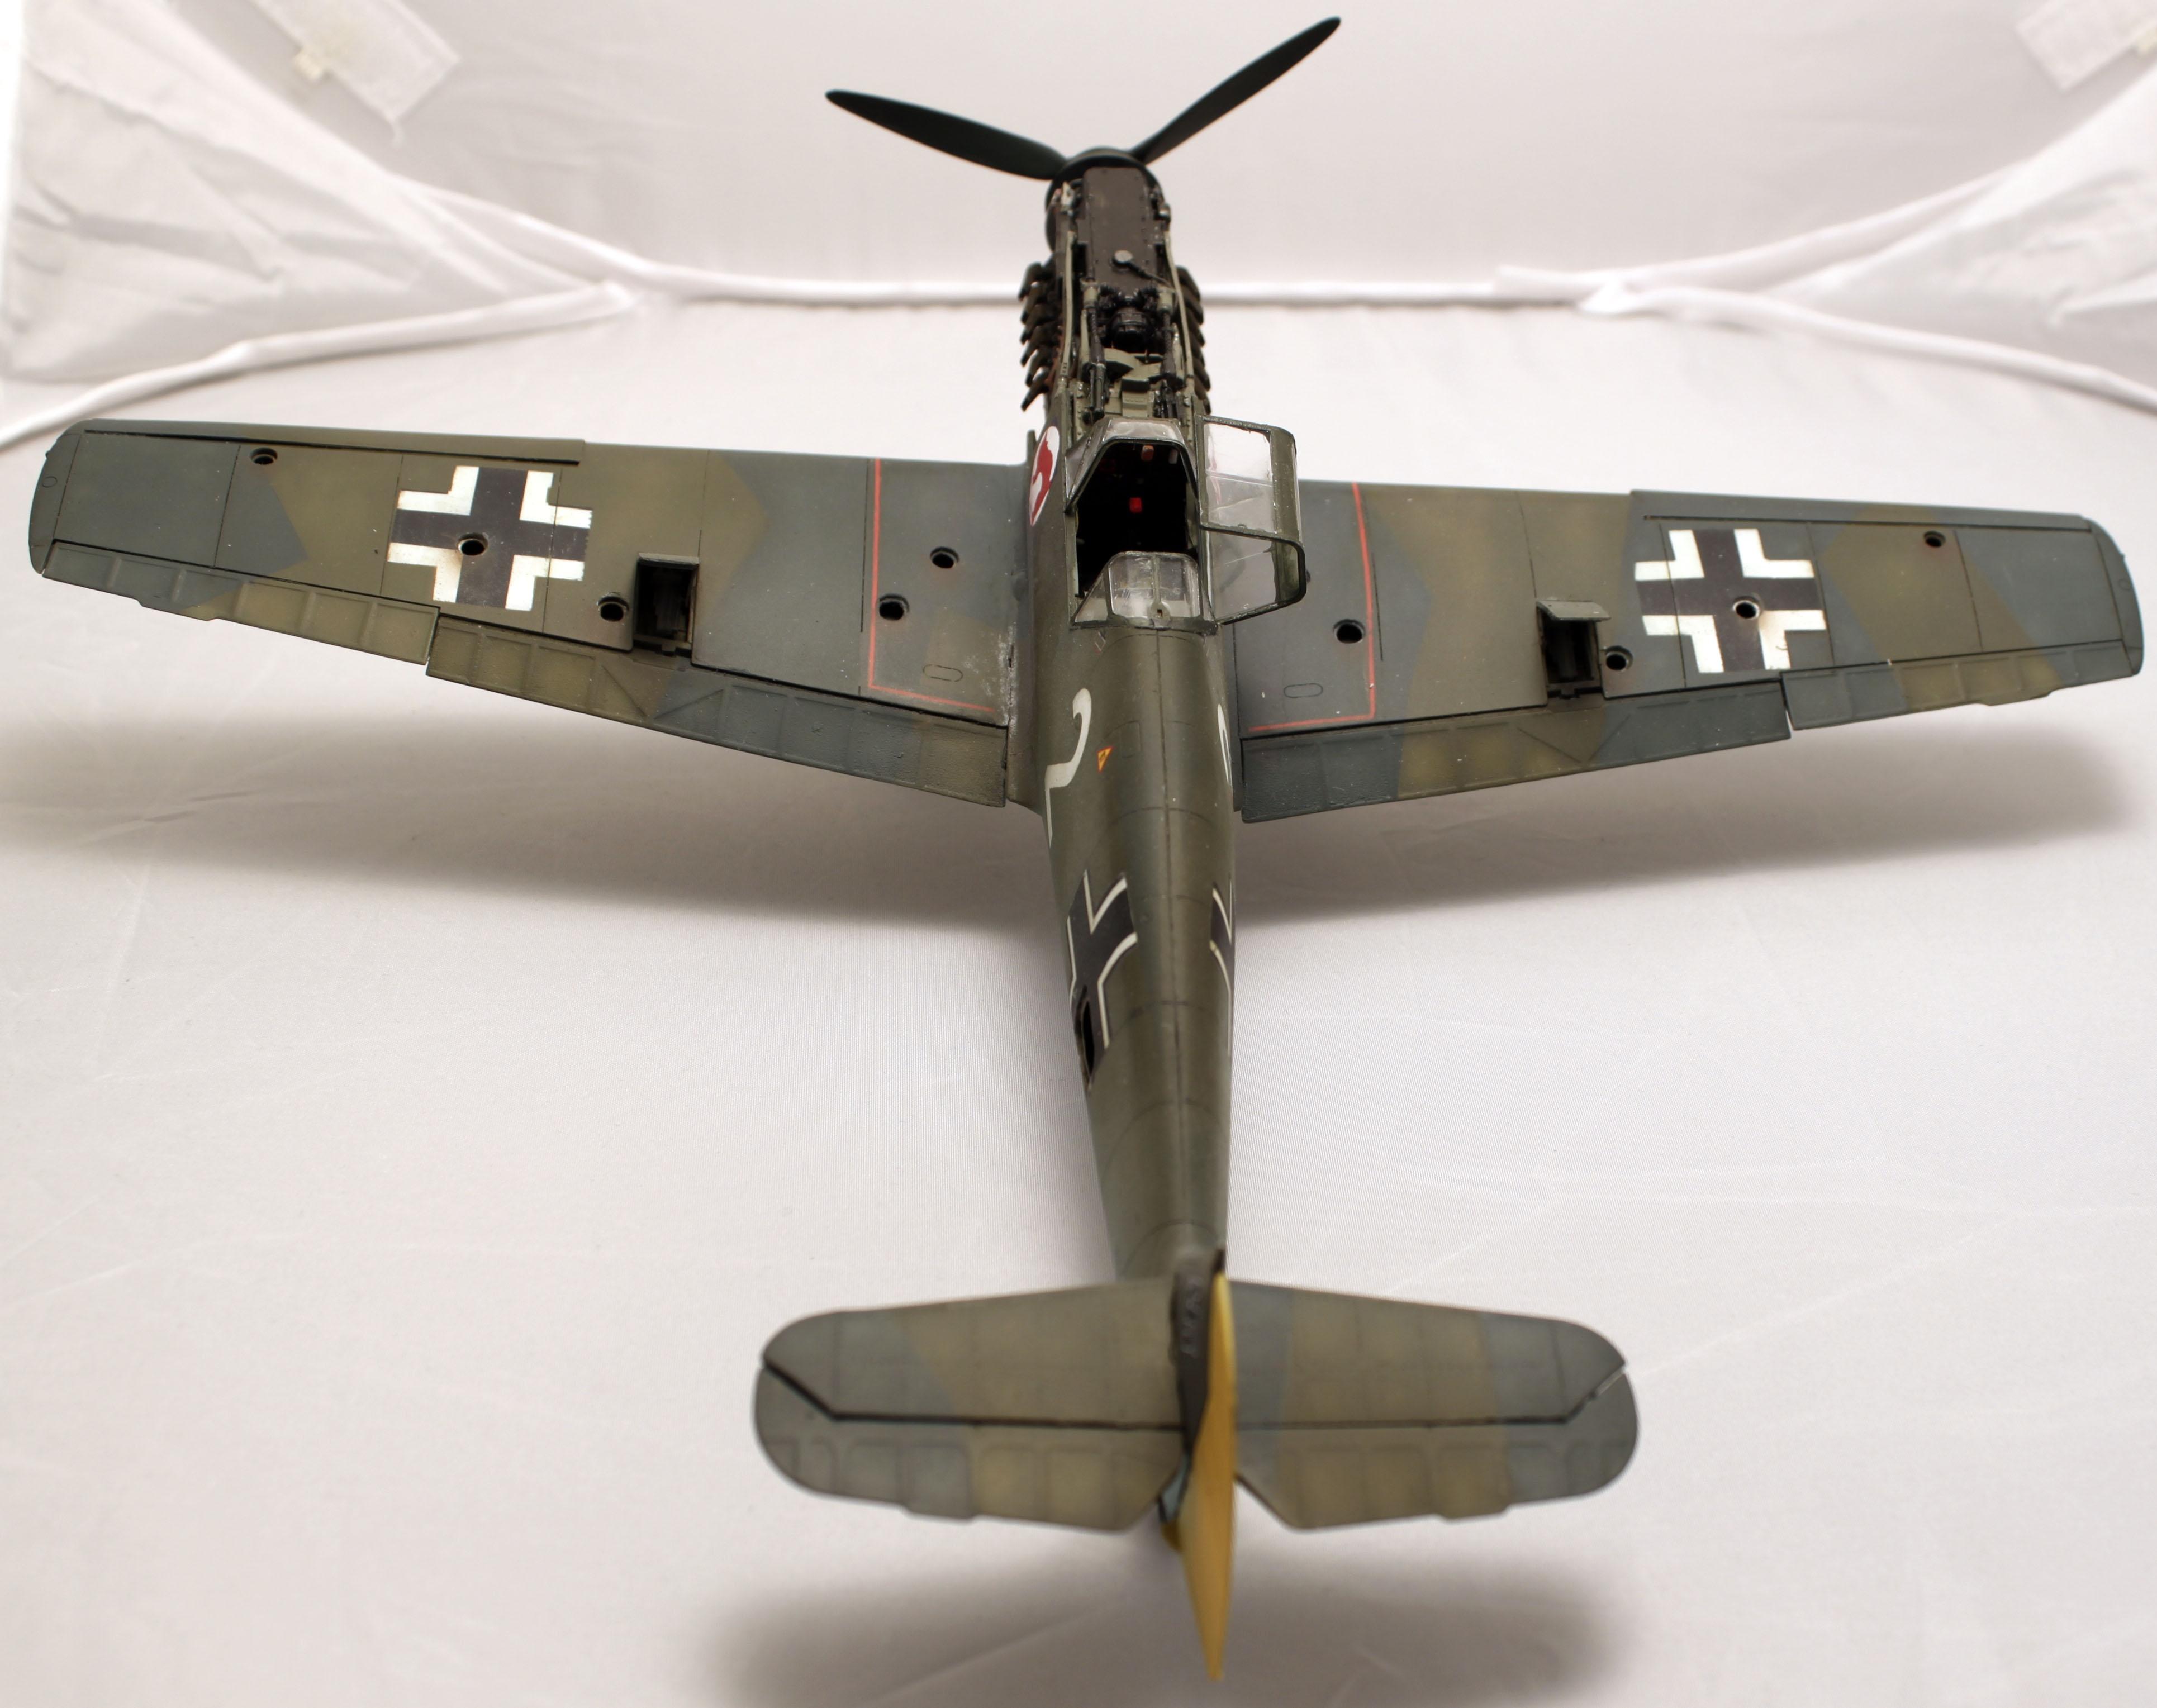 Me Bf 109 E1  [ Eduard 1/32 ] - Page 5 AwpXX5